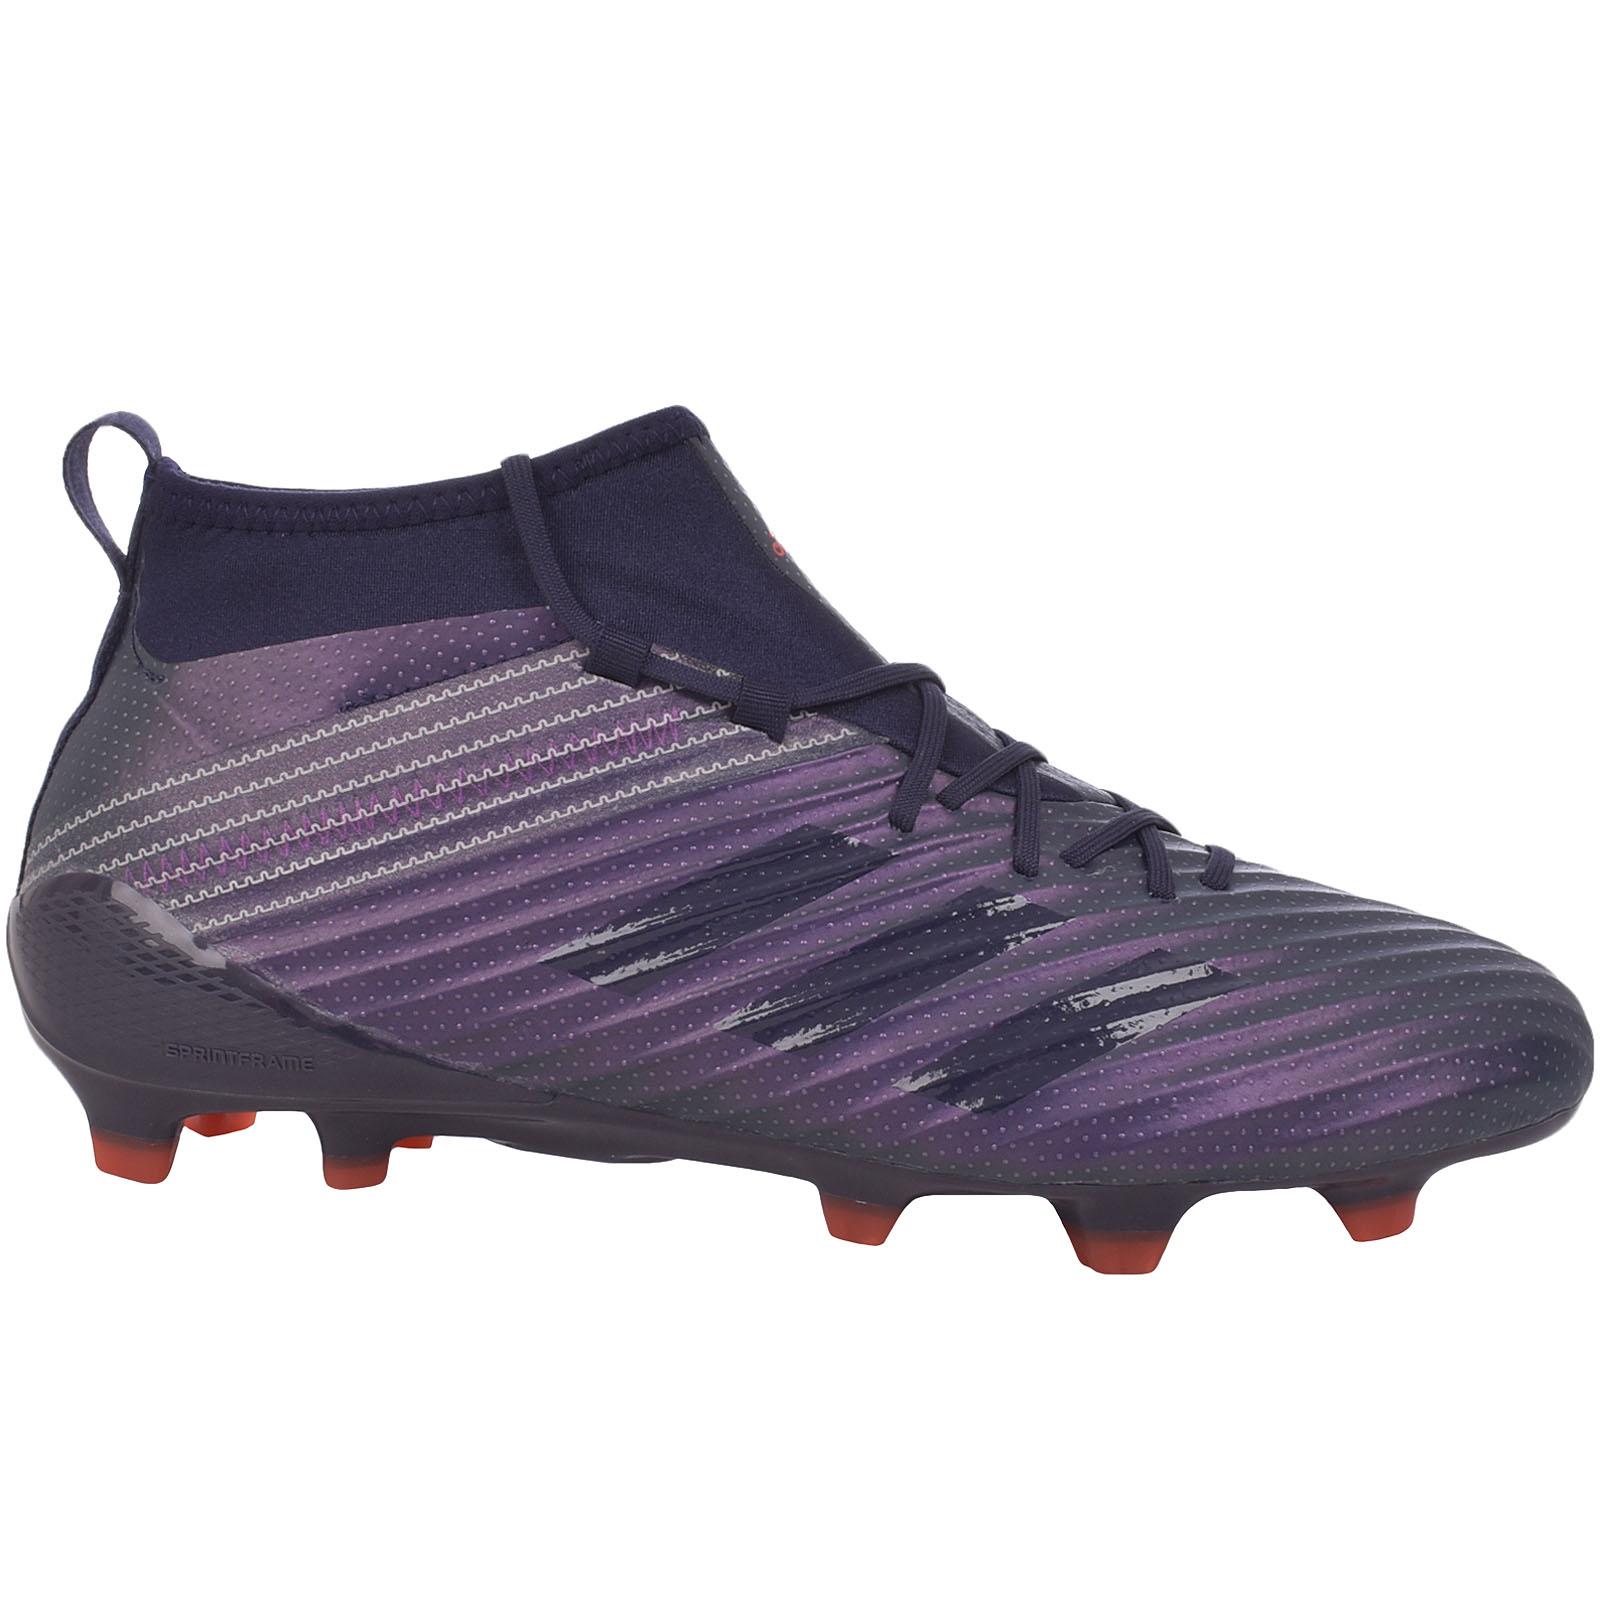 adidas Performance Mens Predator Flare FG Rugby Boots Team